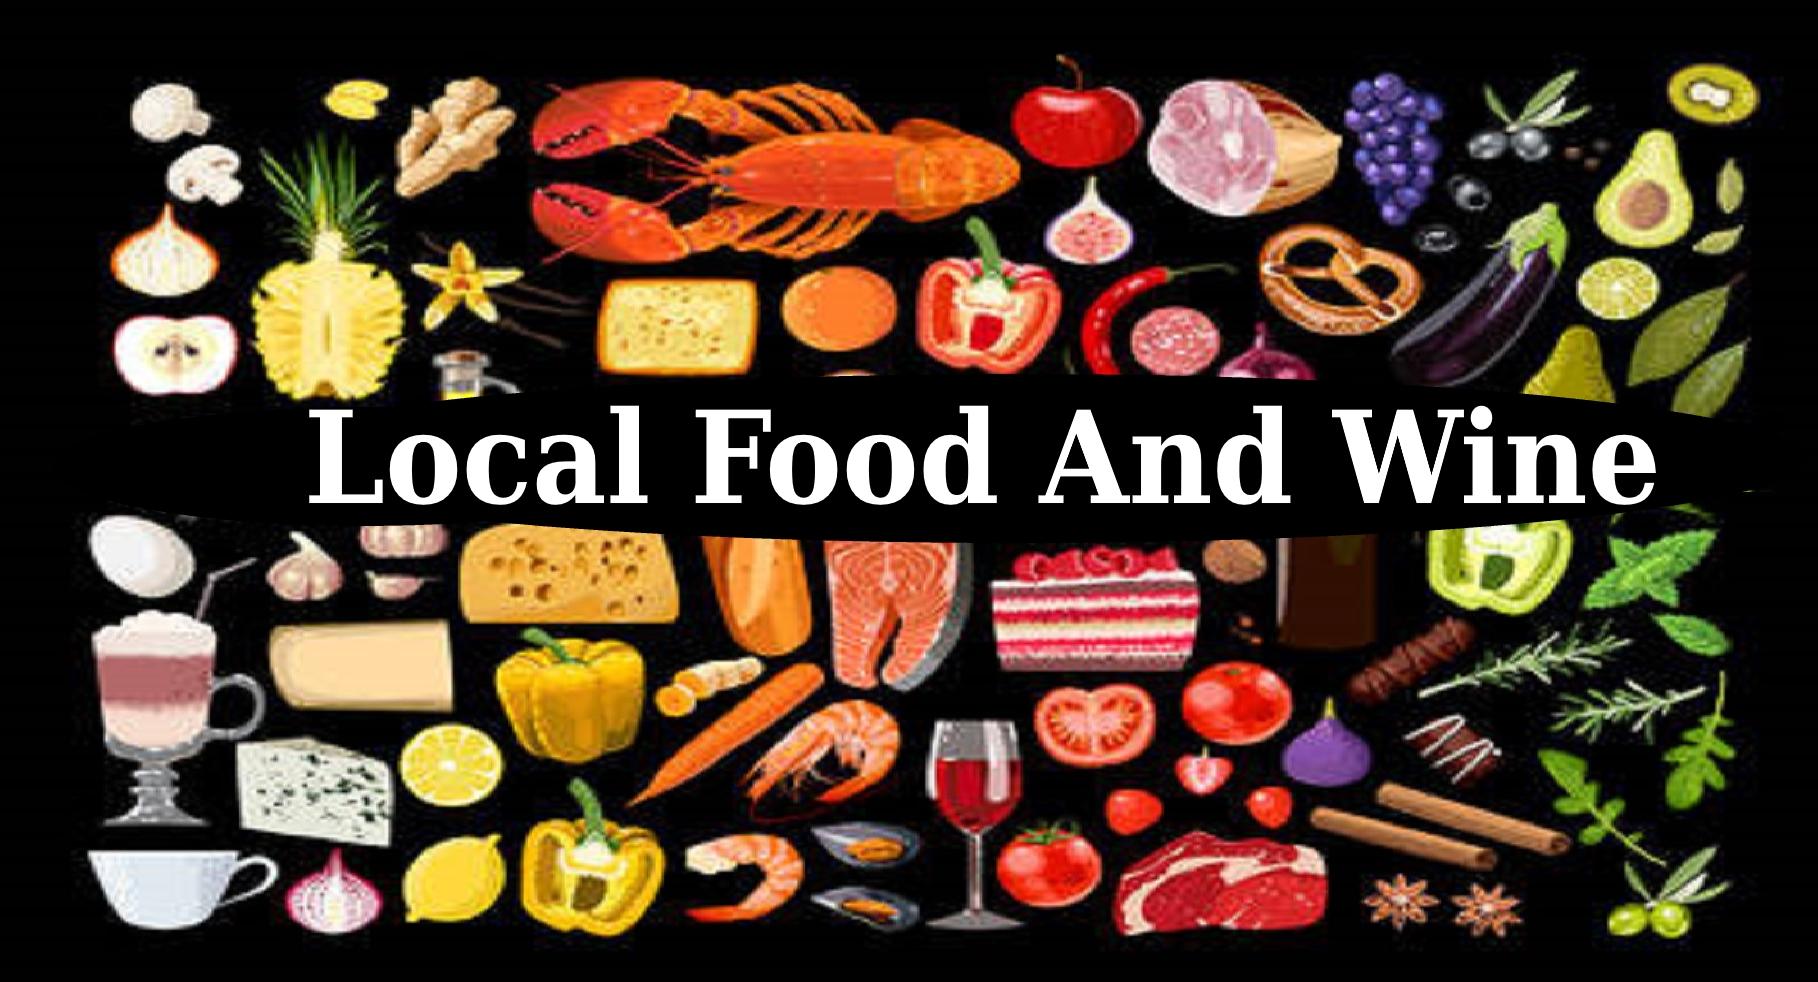 LFAW logo new different-kinds-of-food